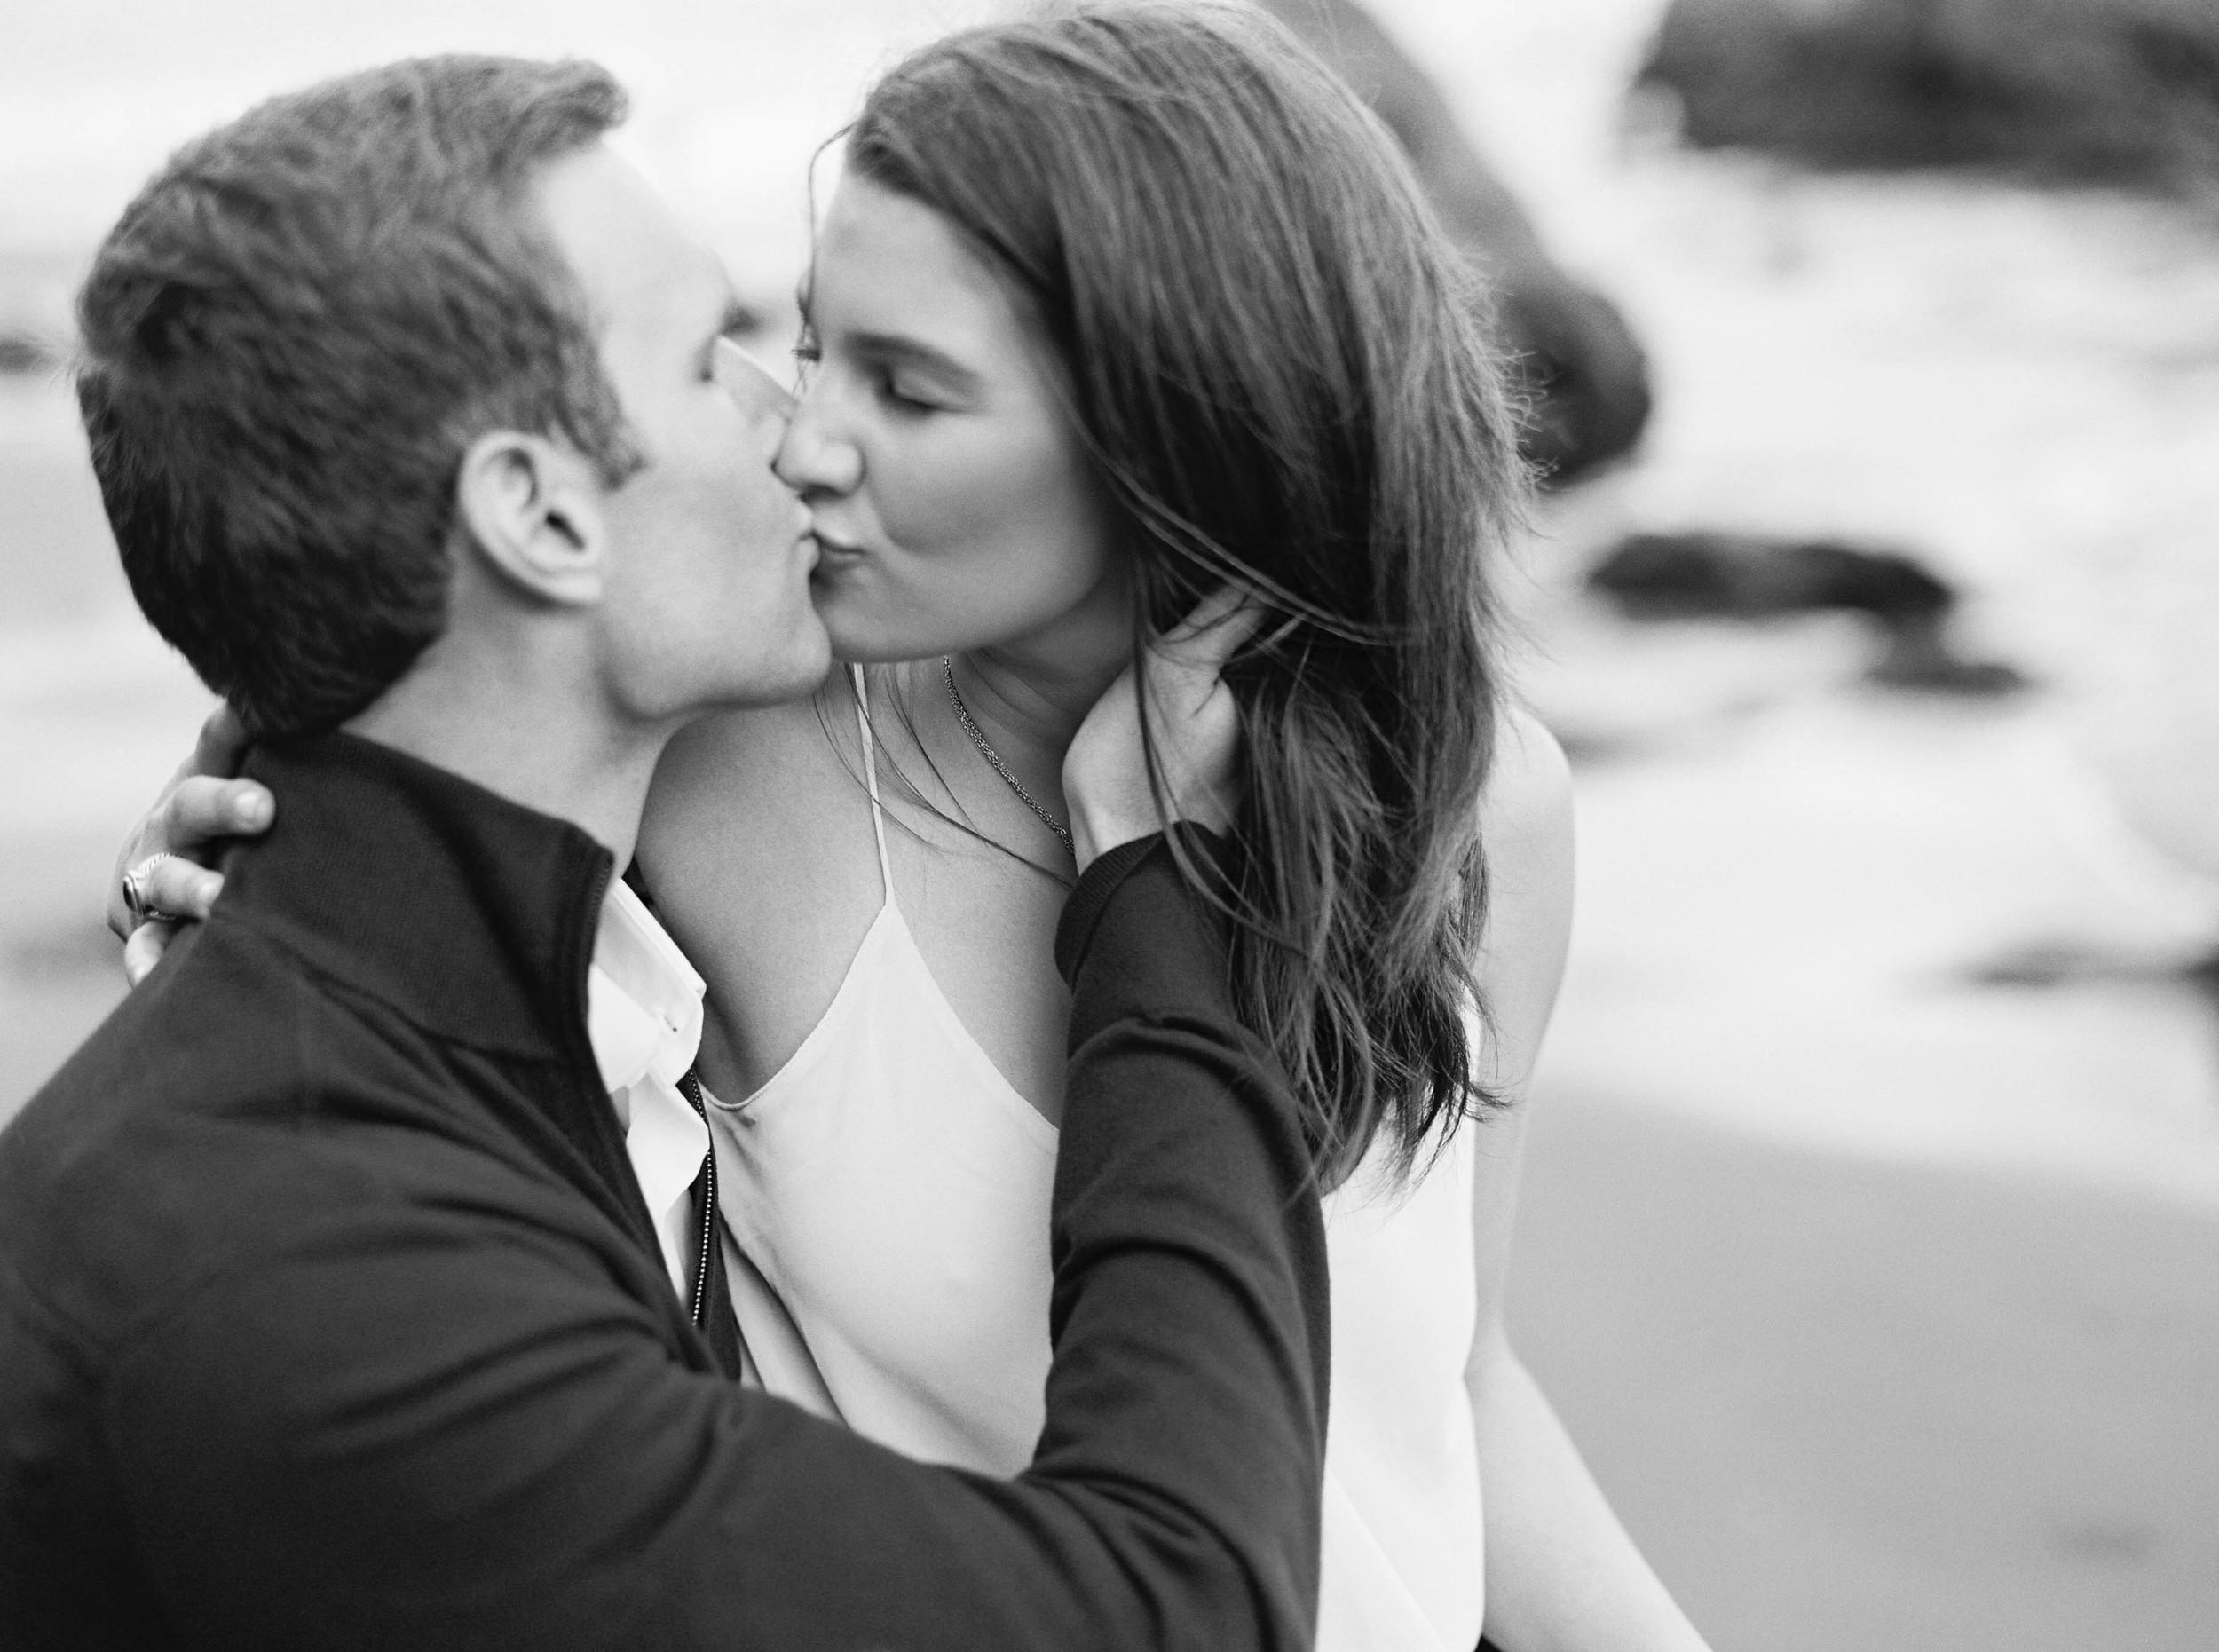 Meghan Mehan Photography - Fine Art Film Wedding Photography - San Francisco | Napa | Sonoma | Big Sur | Santa Barbara - 069.jpg